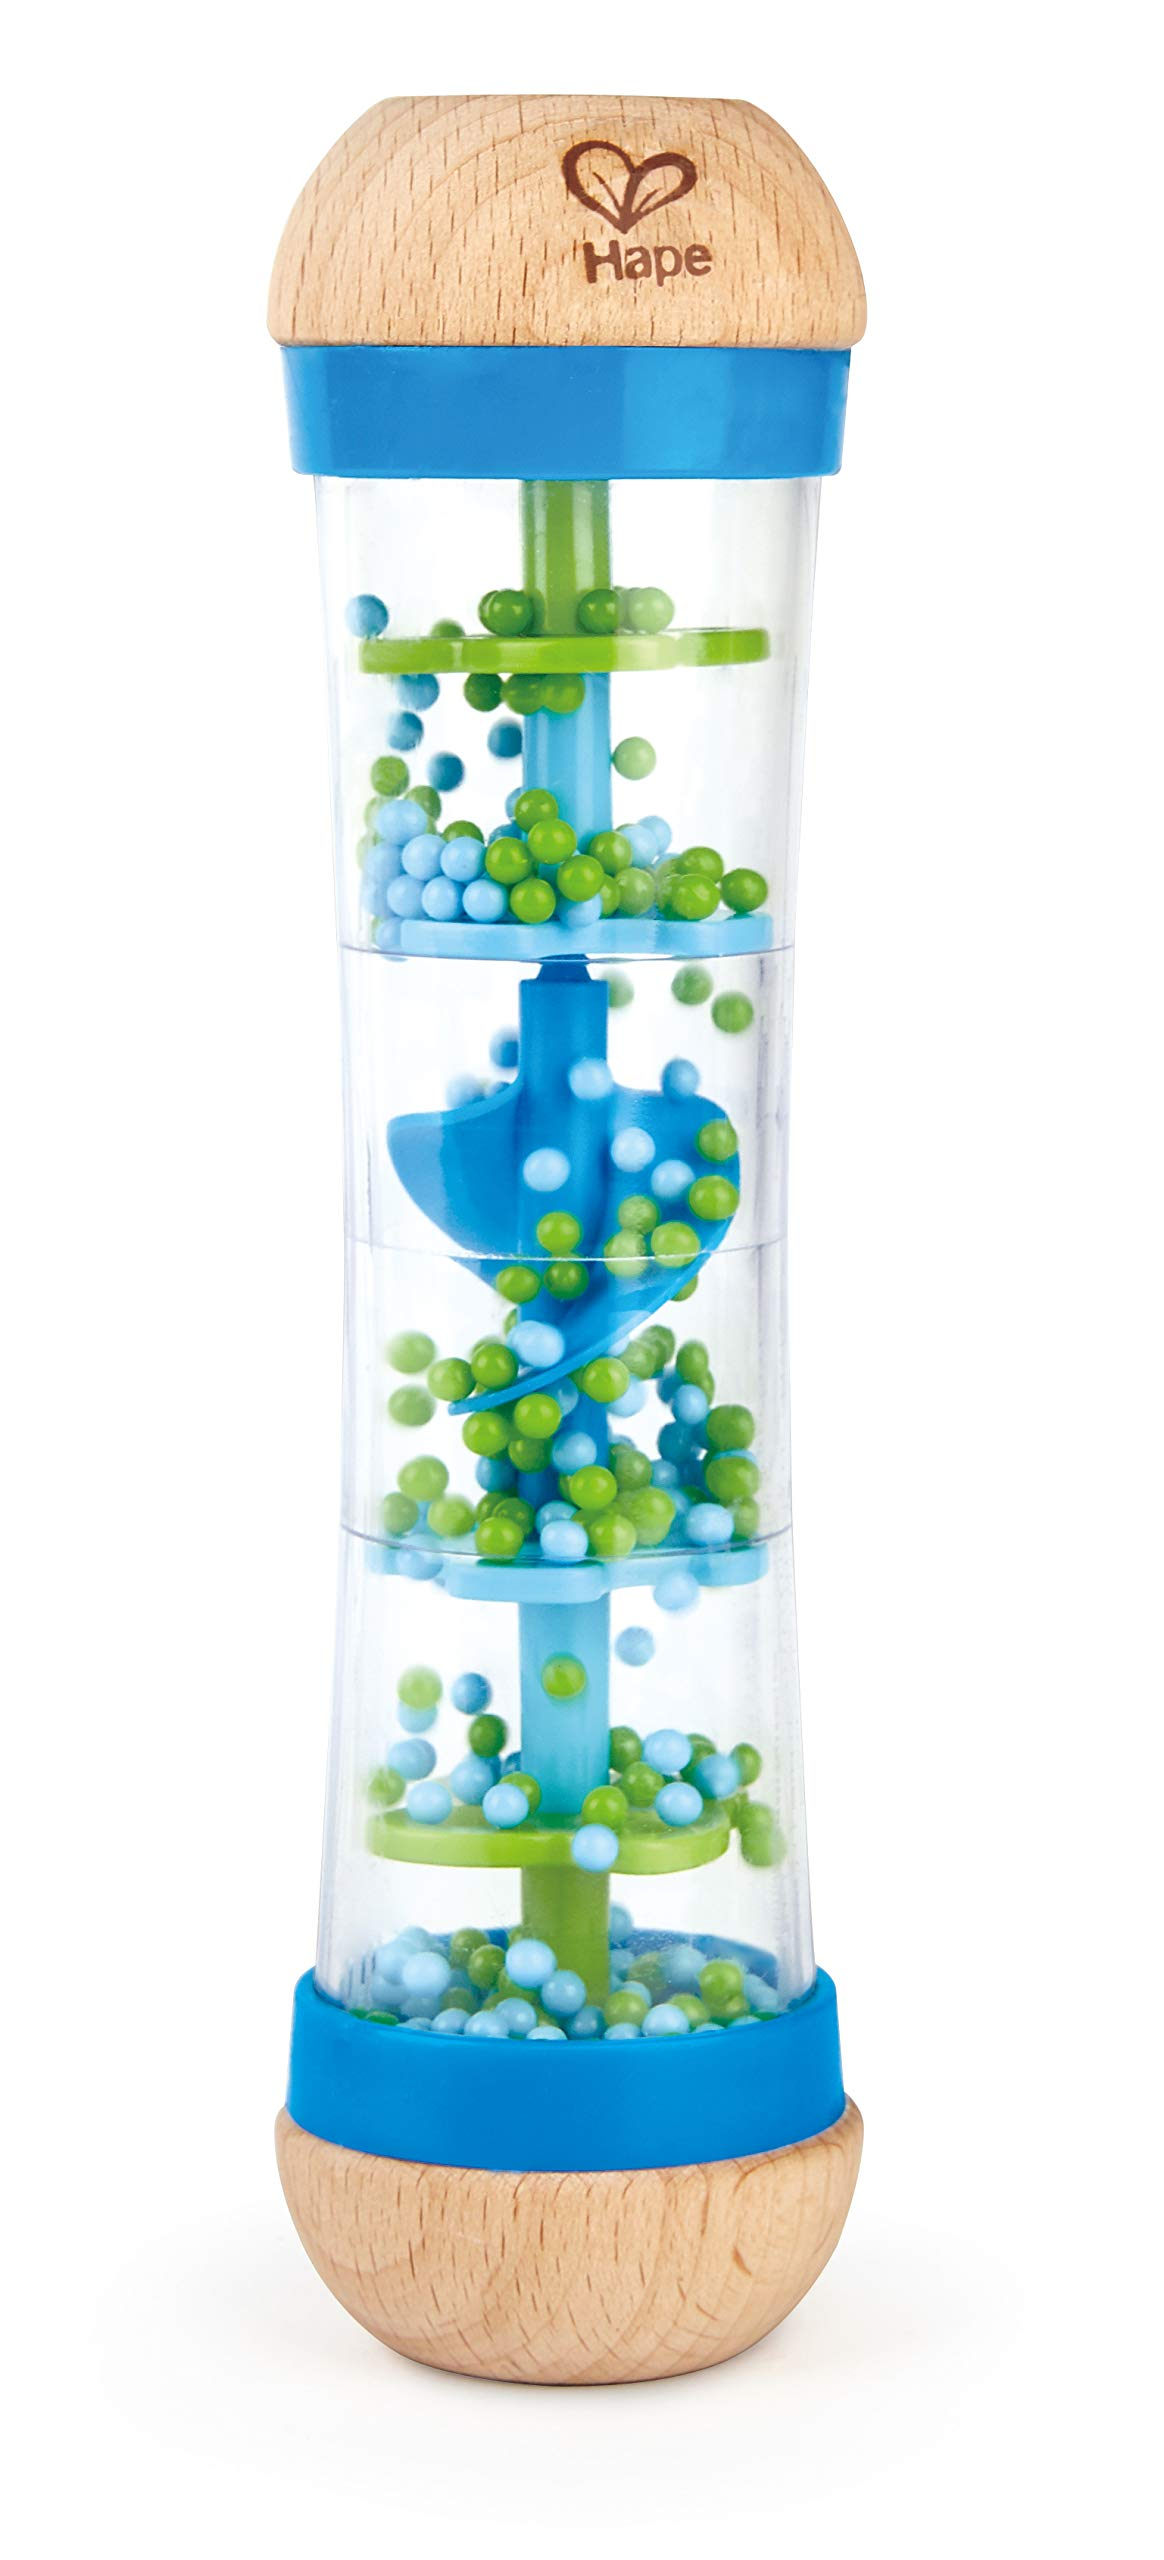 Hape Beaded Raindrops | Mini Wooden Musical Shake & Rattle Rainmaker Toy, Blue